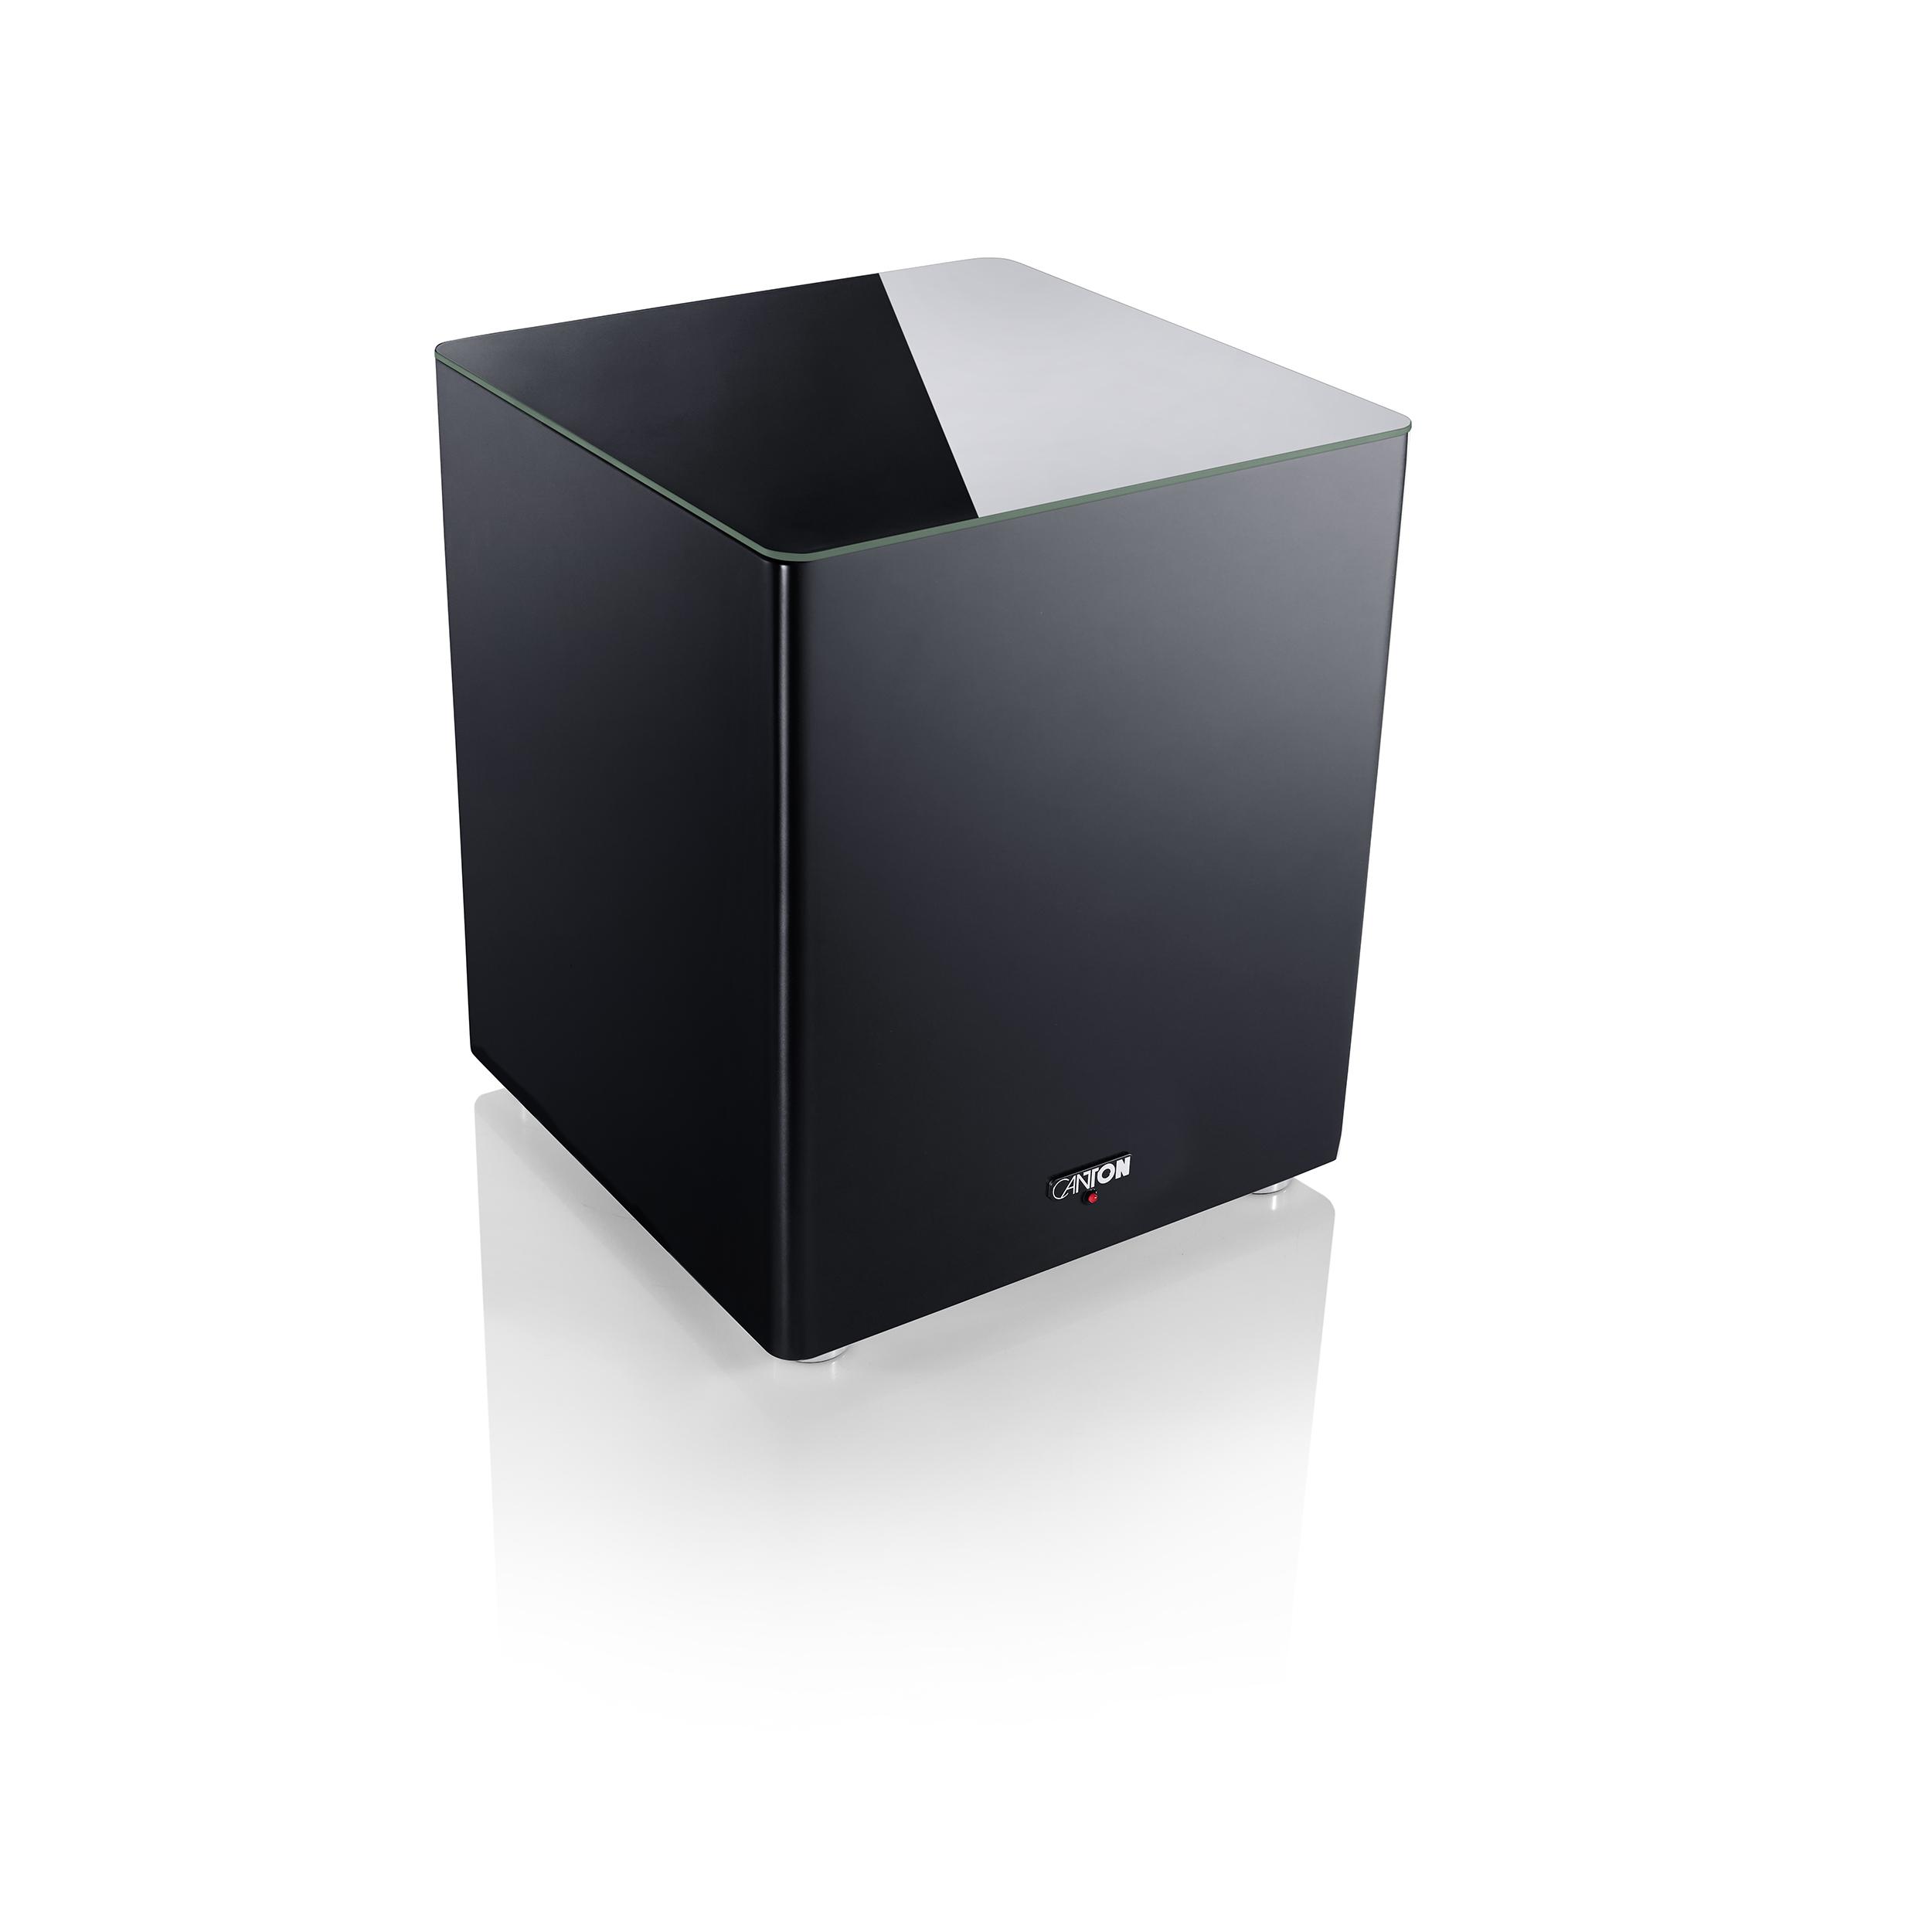 Canton Smart SUB 12 schwarz Stück Aktiv-Wireless-Subwoofer 546155